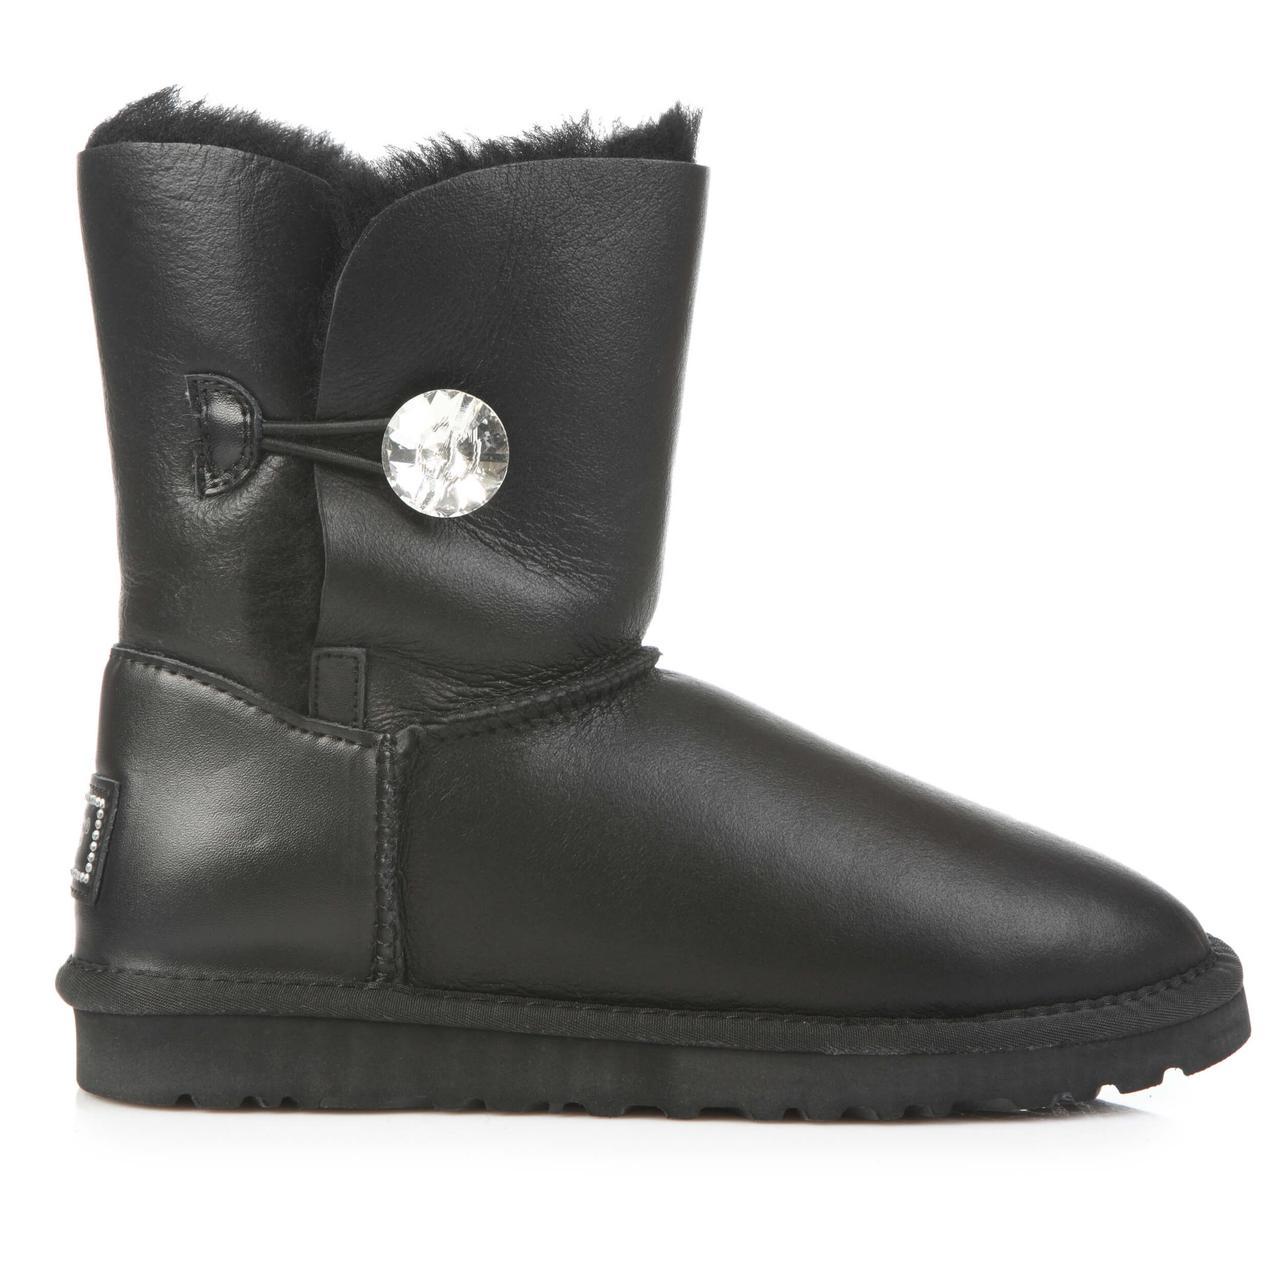 UGG Women's Bailey Bling Black Leather